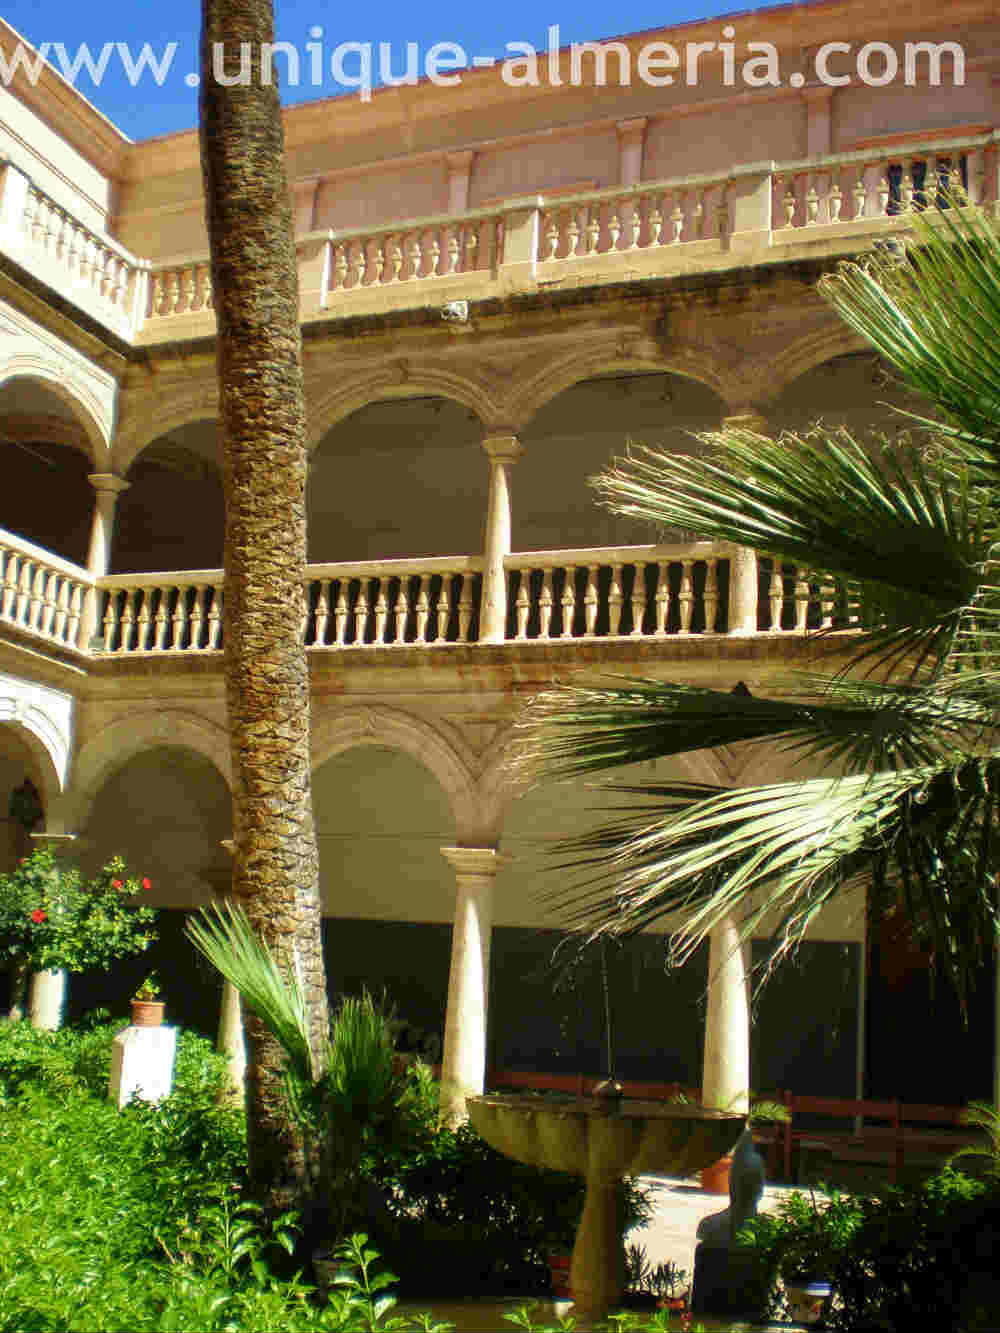 School of Art in Almeria City (Spain)